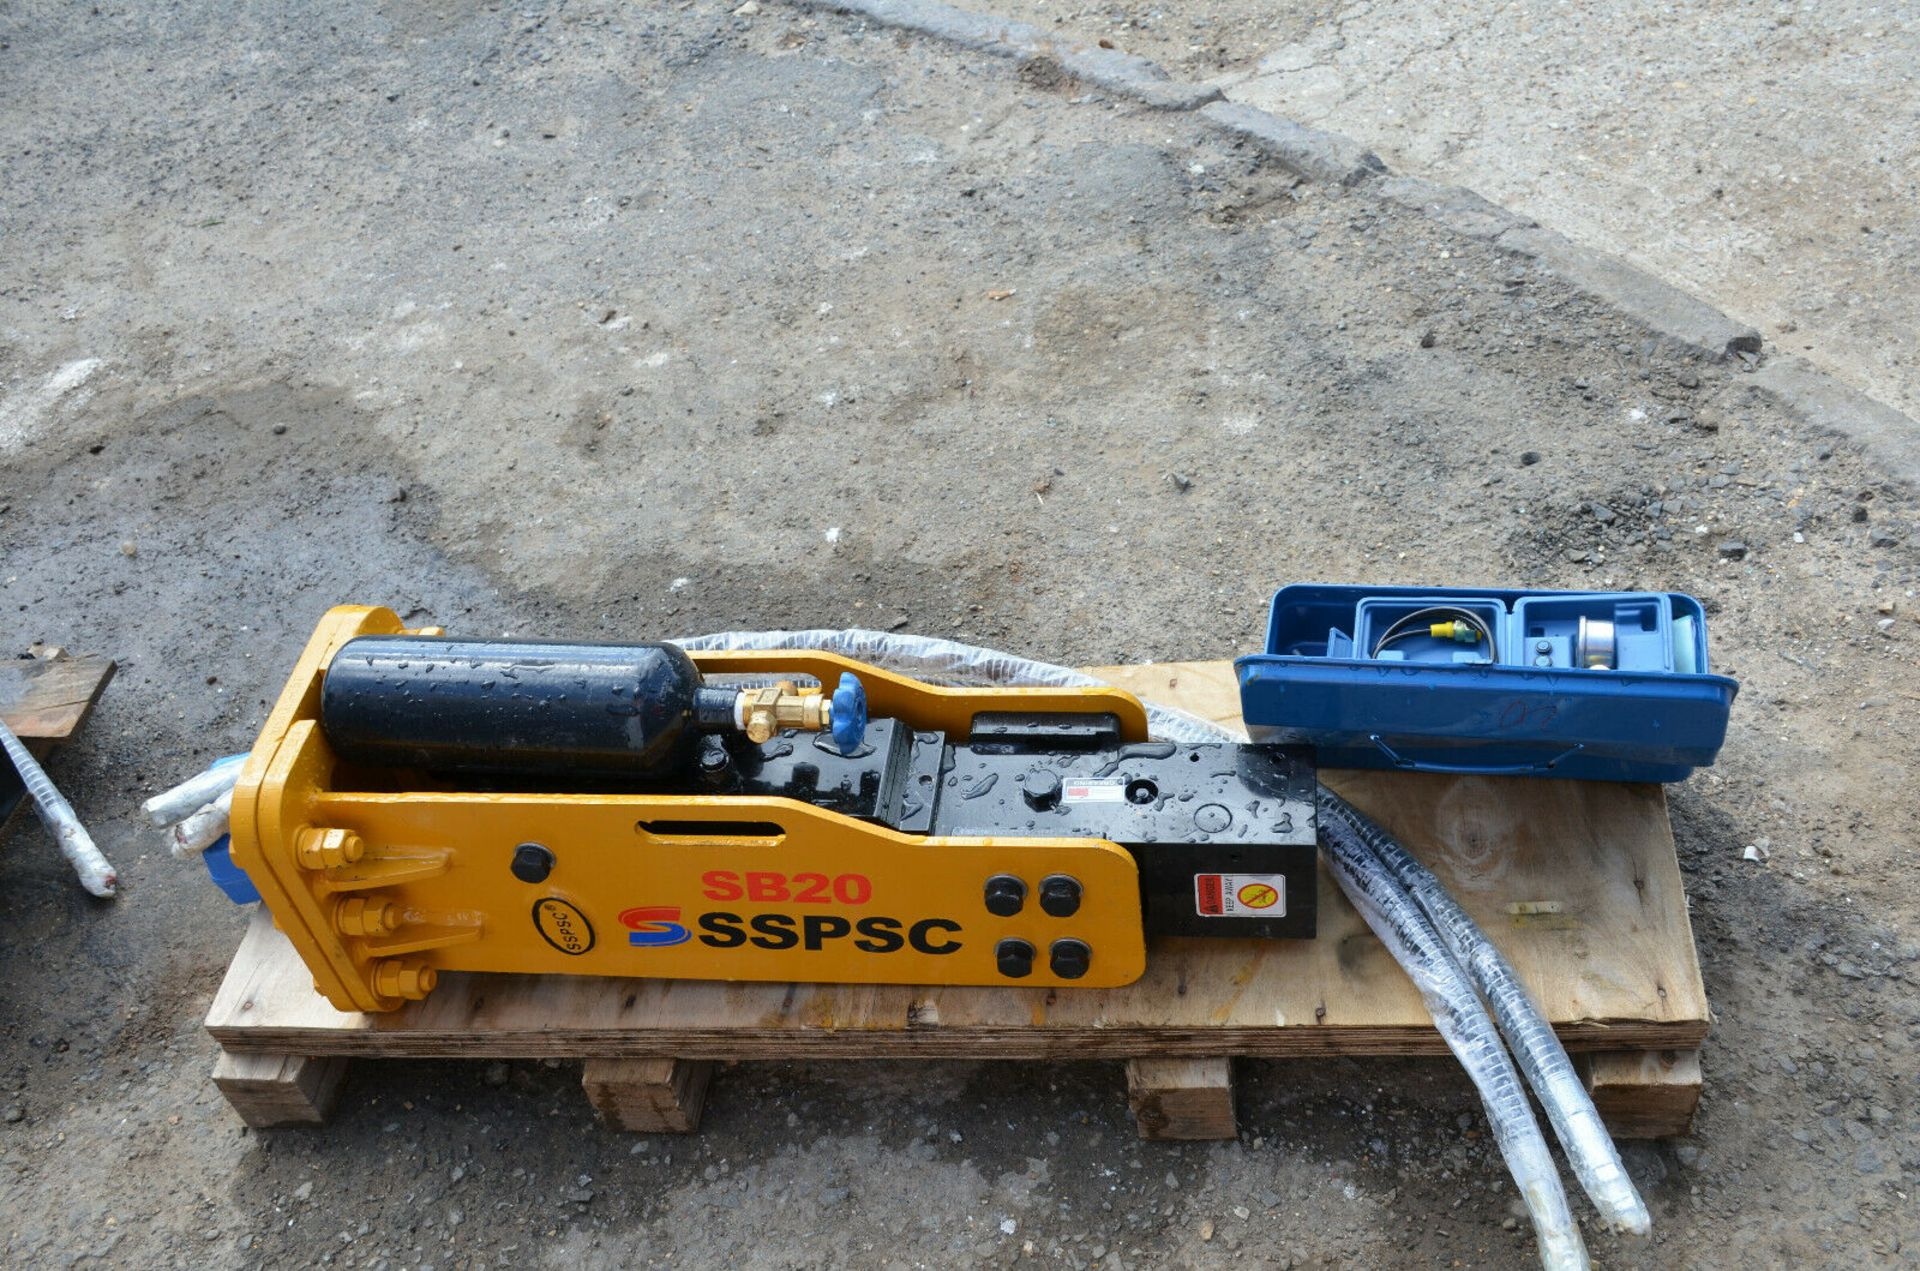 SSPSC SB20 Hydraulic Breaker - Image 5 of 6